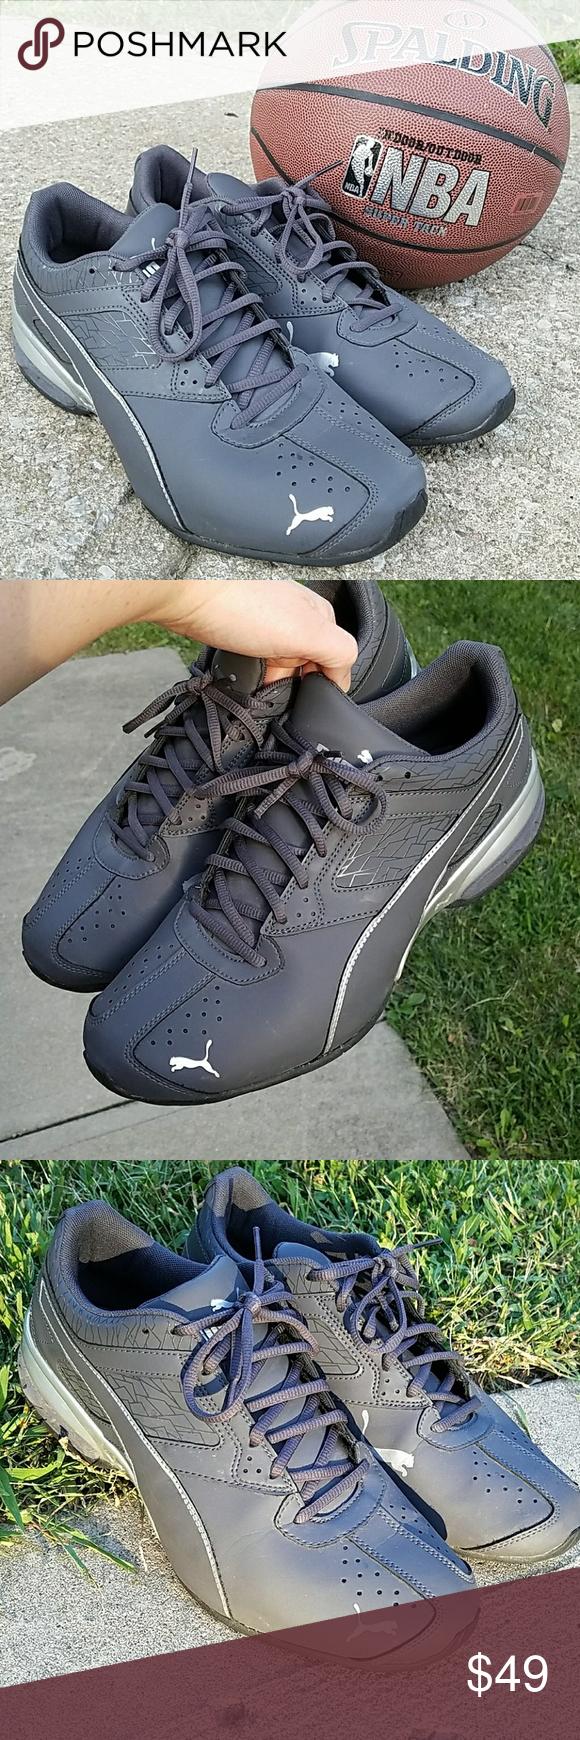 37f68f5e7879 ... Puma Mens Tazon 6 Fracture FM Running Shoes Mens gray Puma running shoes .